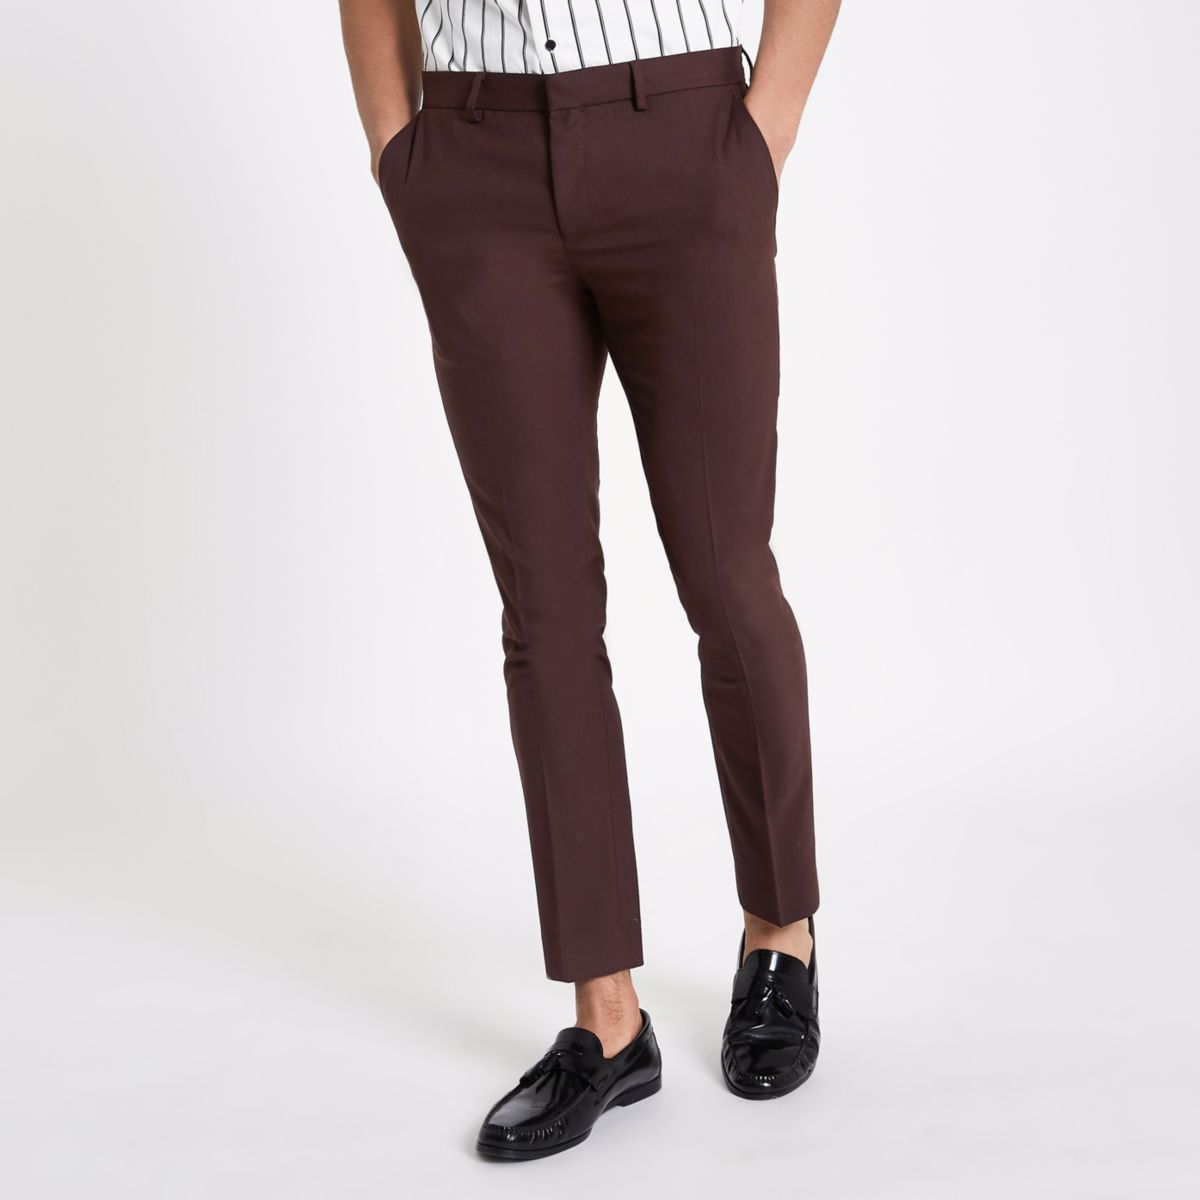 Burgundy super skinny smart pants